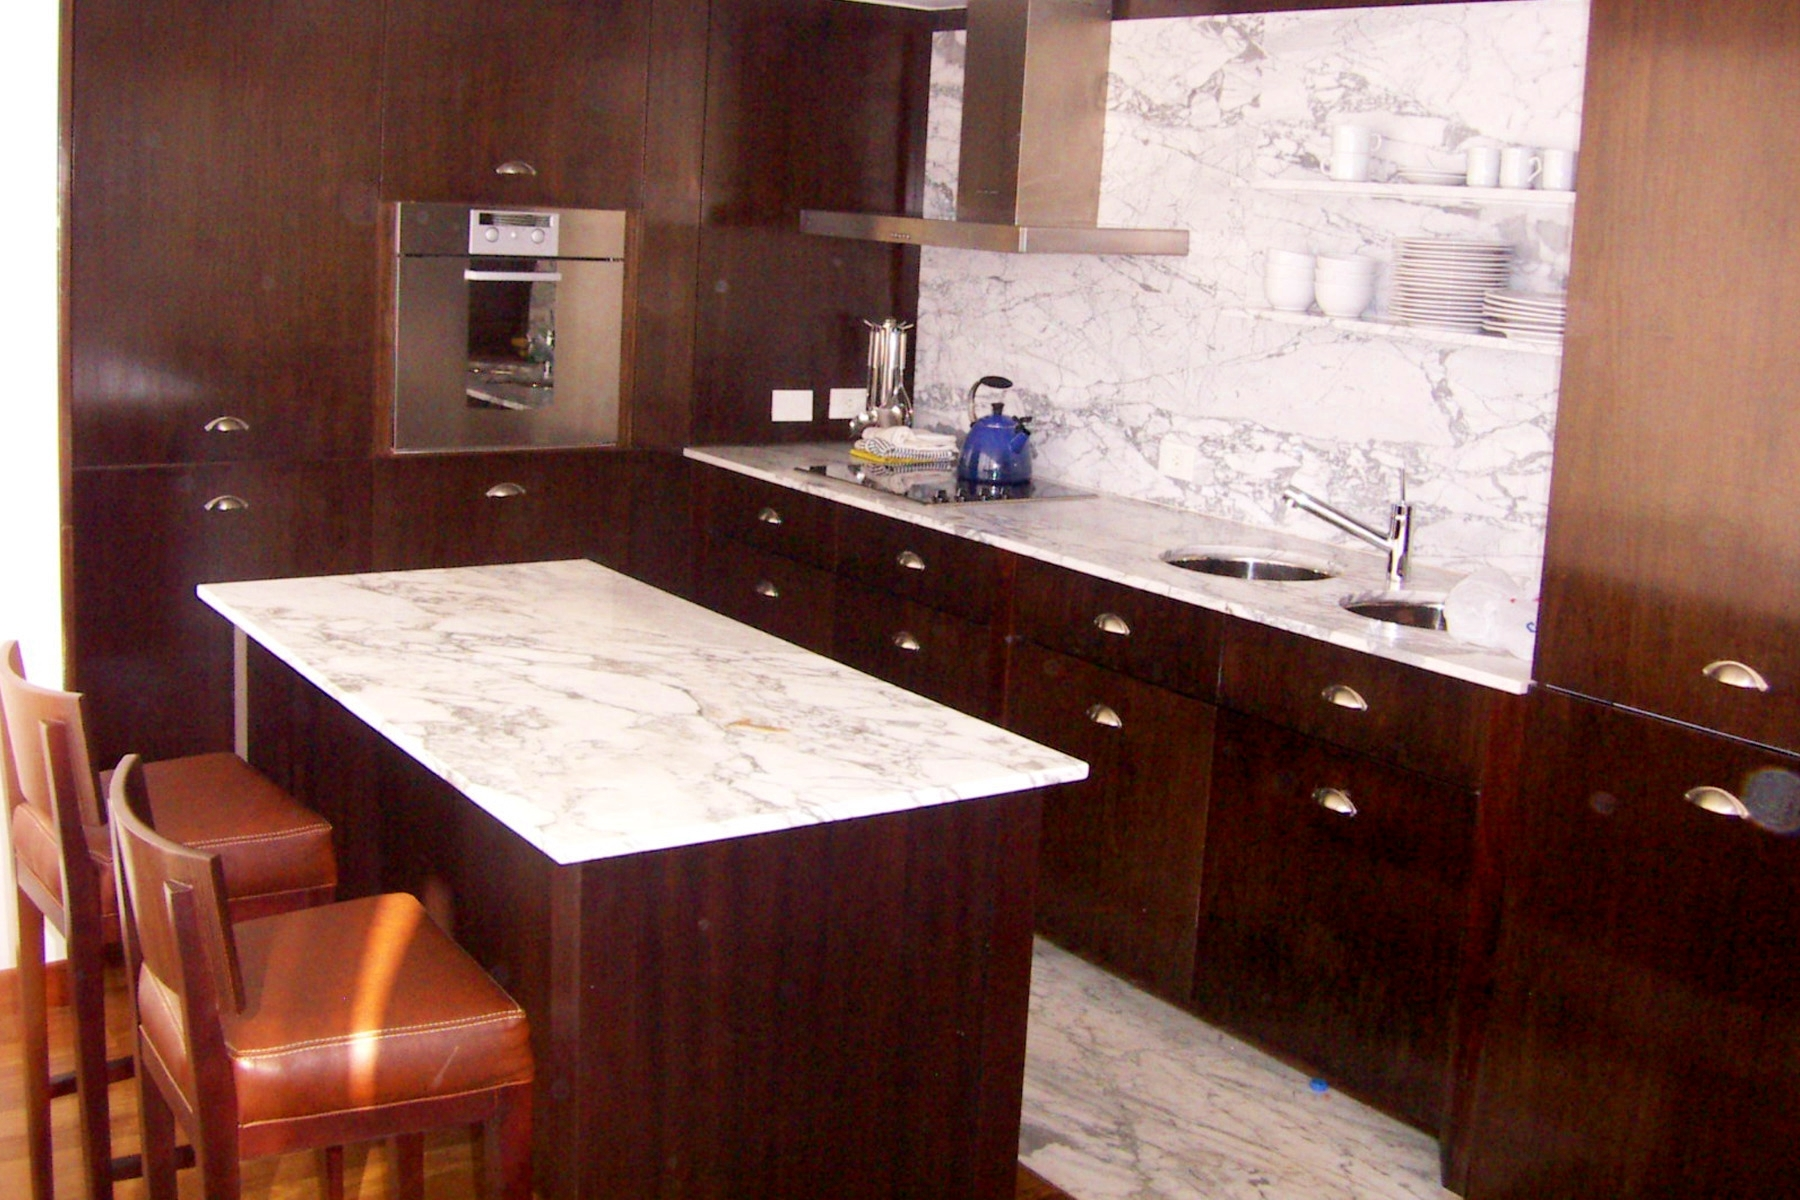 Additional photo for property listing at Sofisticado Duplex en El Porteño Petrona Eyle 450 Other Argentina, Otras Áreas En Argentina 1107 Argentina